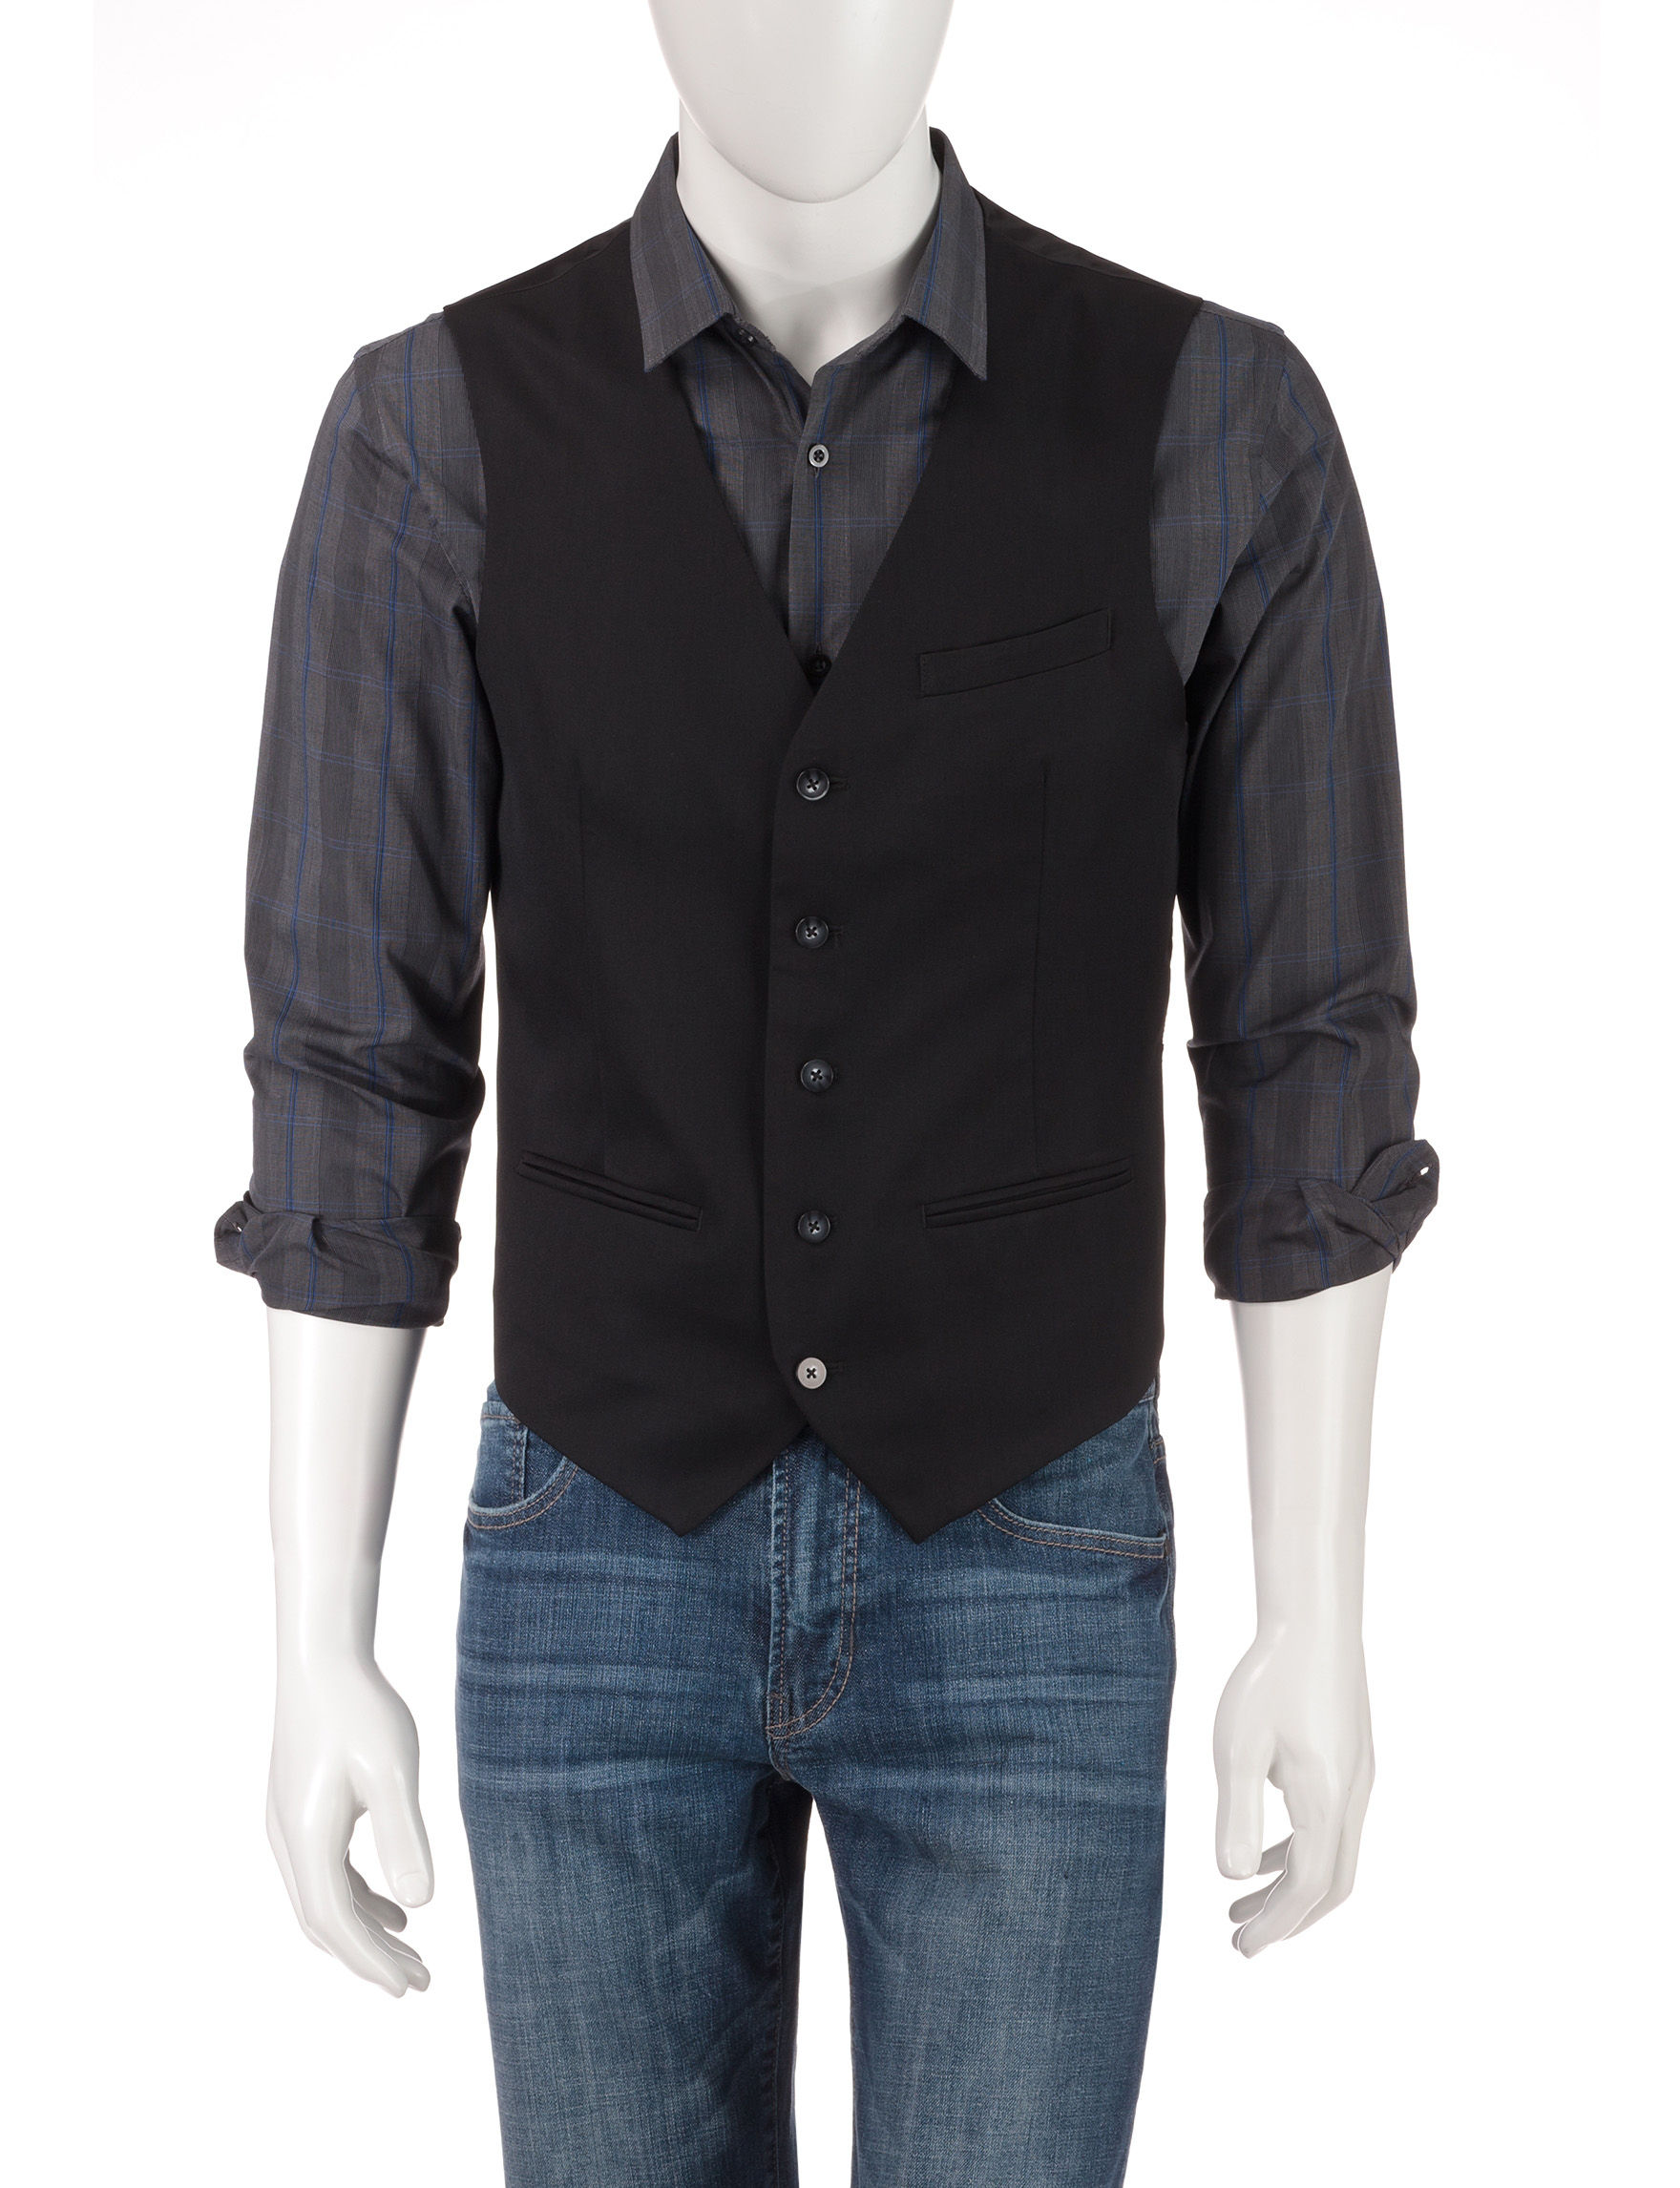 Axist Black Dress Shirts